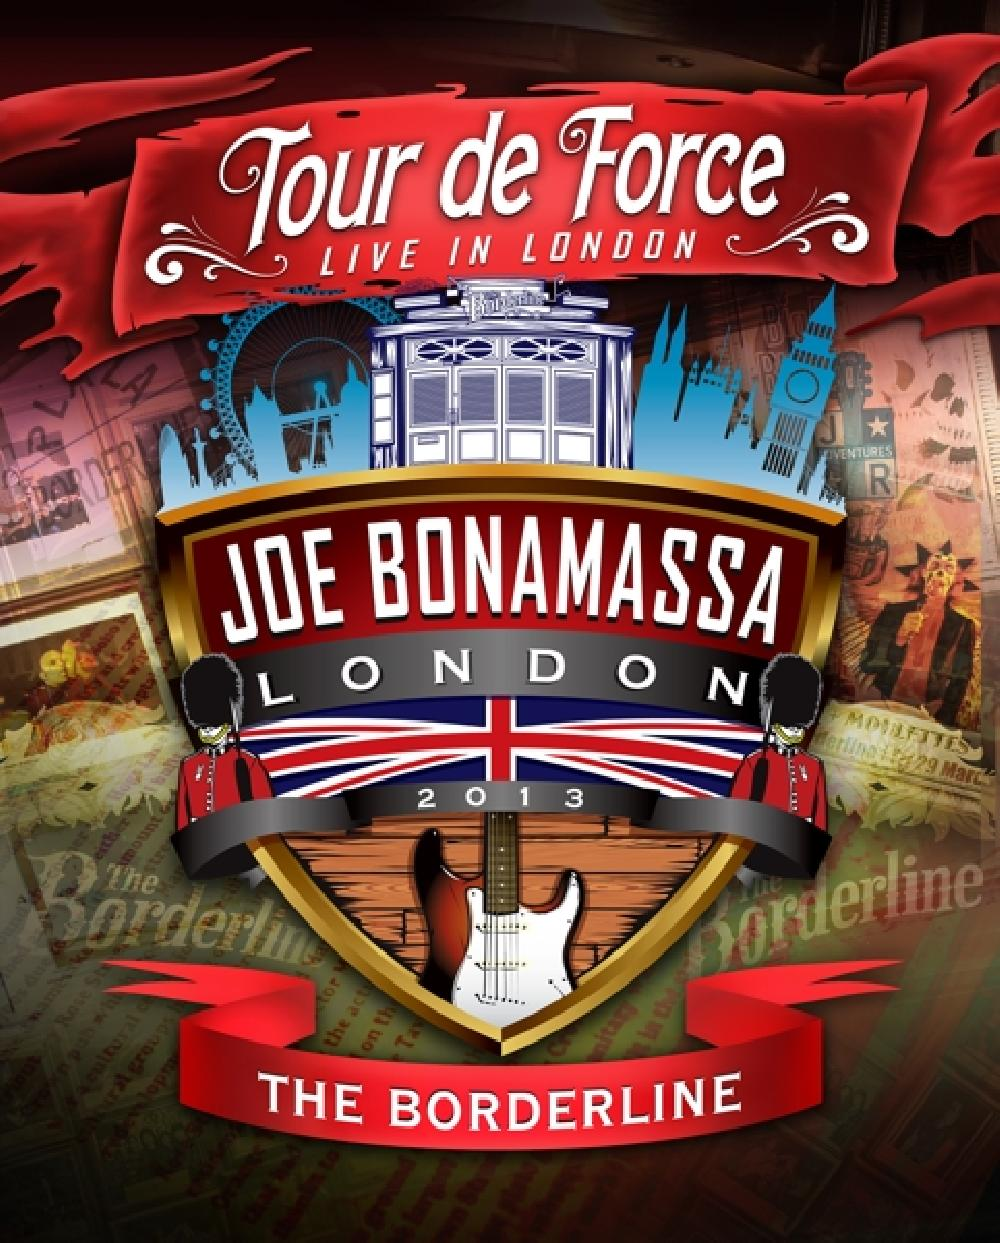 JOE BONAMASSA - TOUR DE FORCE - BORDERLIN (nieuw) - DVD